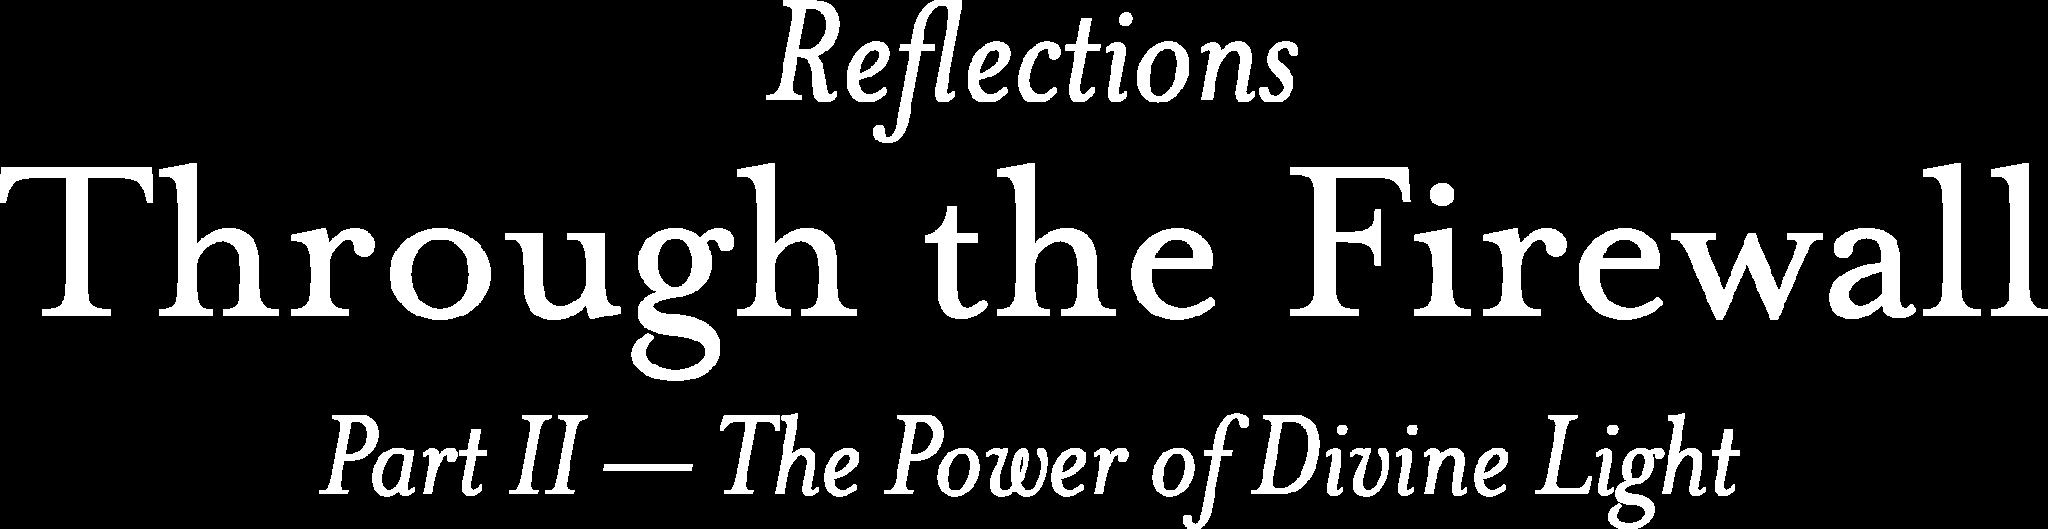 Refl3ections: Through the Firewall Part II - The Power of Divine Light